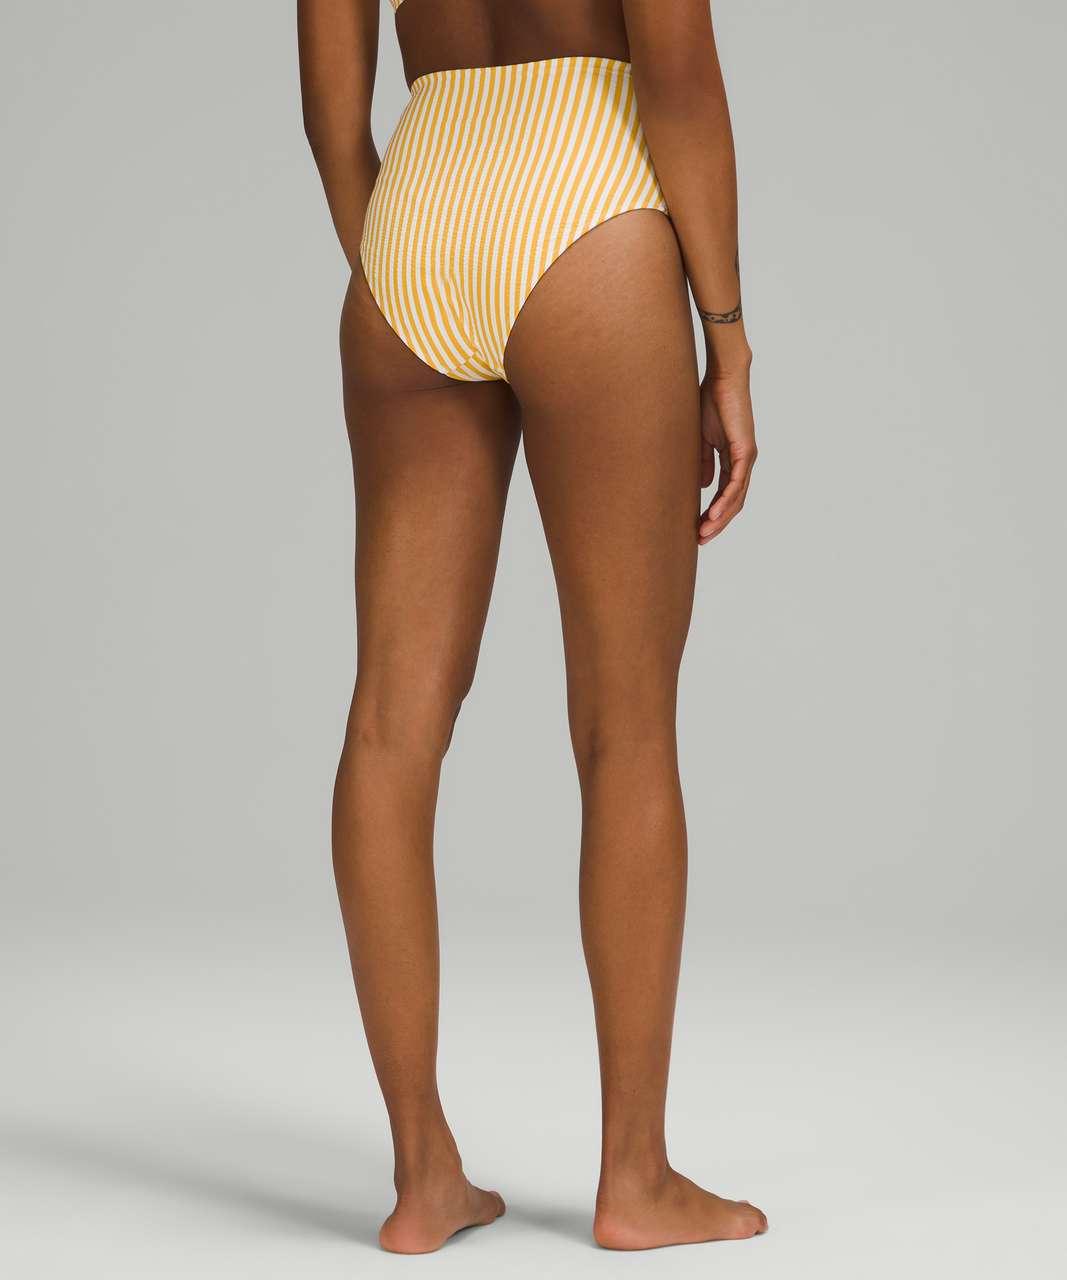 Lululemon Waterside Seersucker High Waist Skimpy Swim Bottom - Energize Stripe White Wheat Yellow